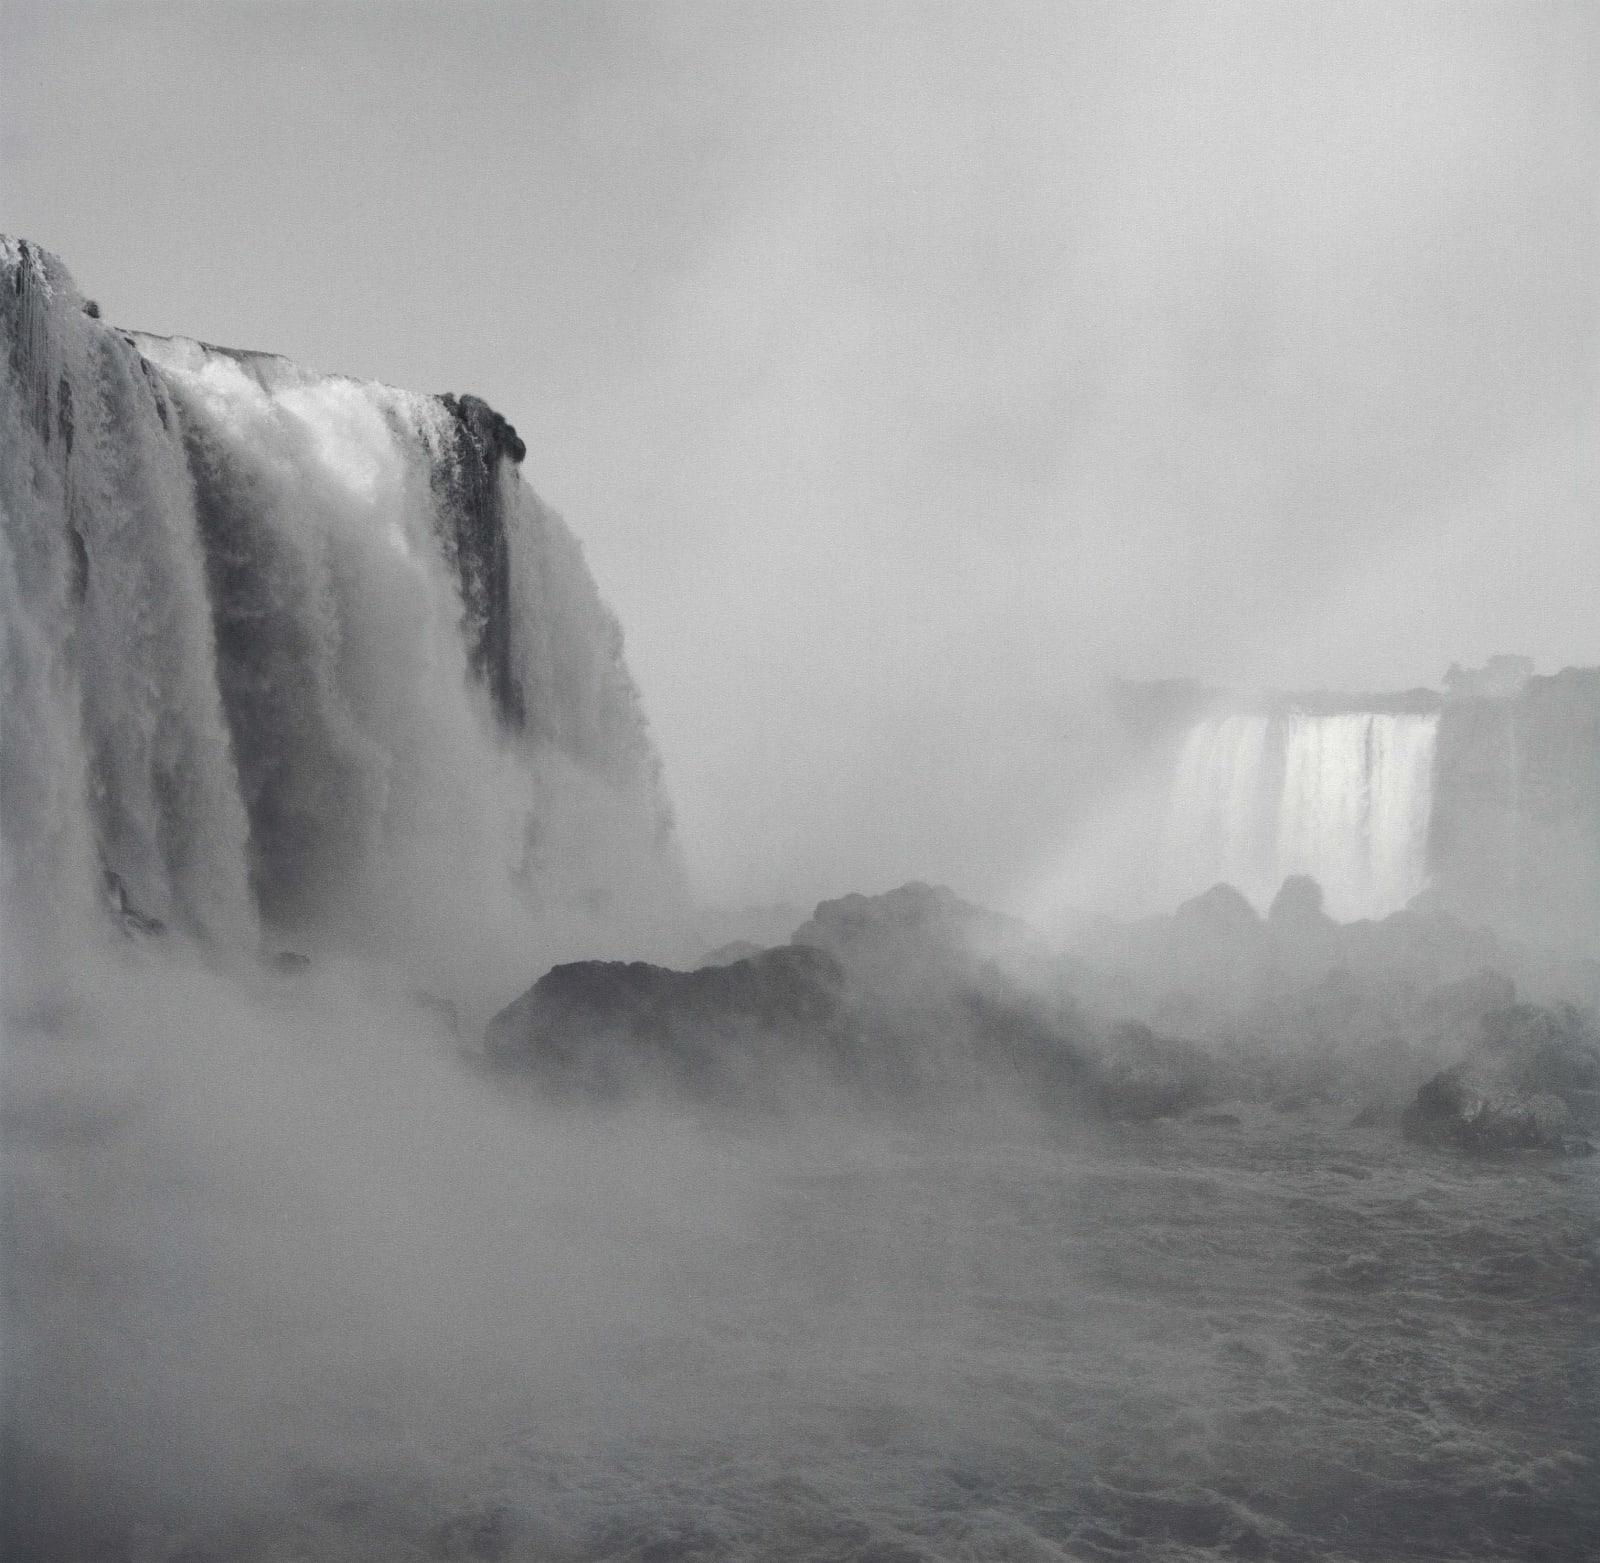 Lynn Davis photograph of Iguazu Falls waterfall from Brazil side with mist rising